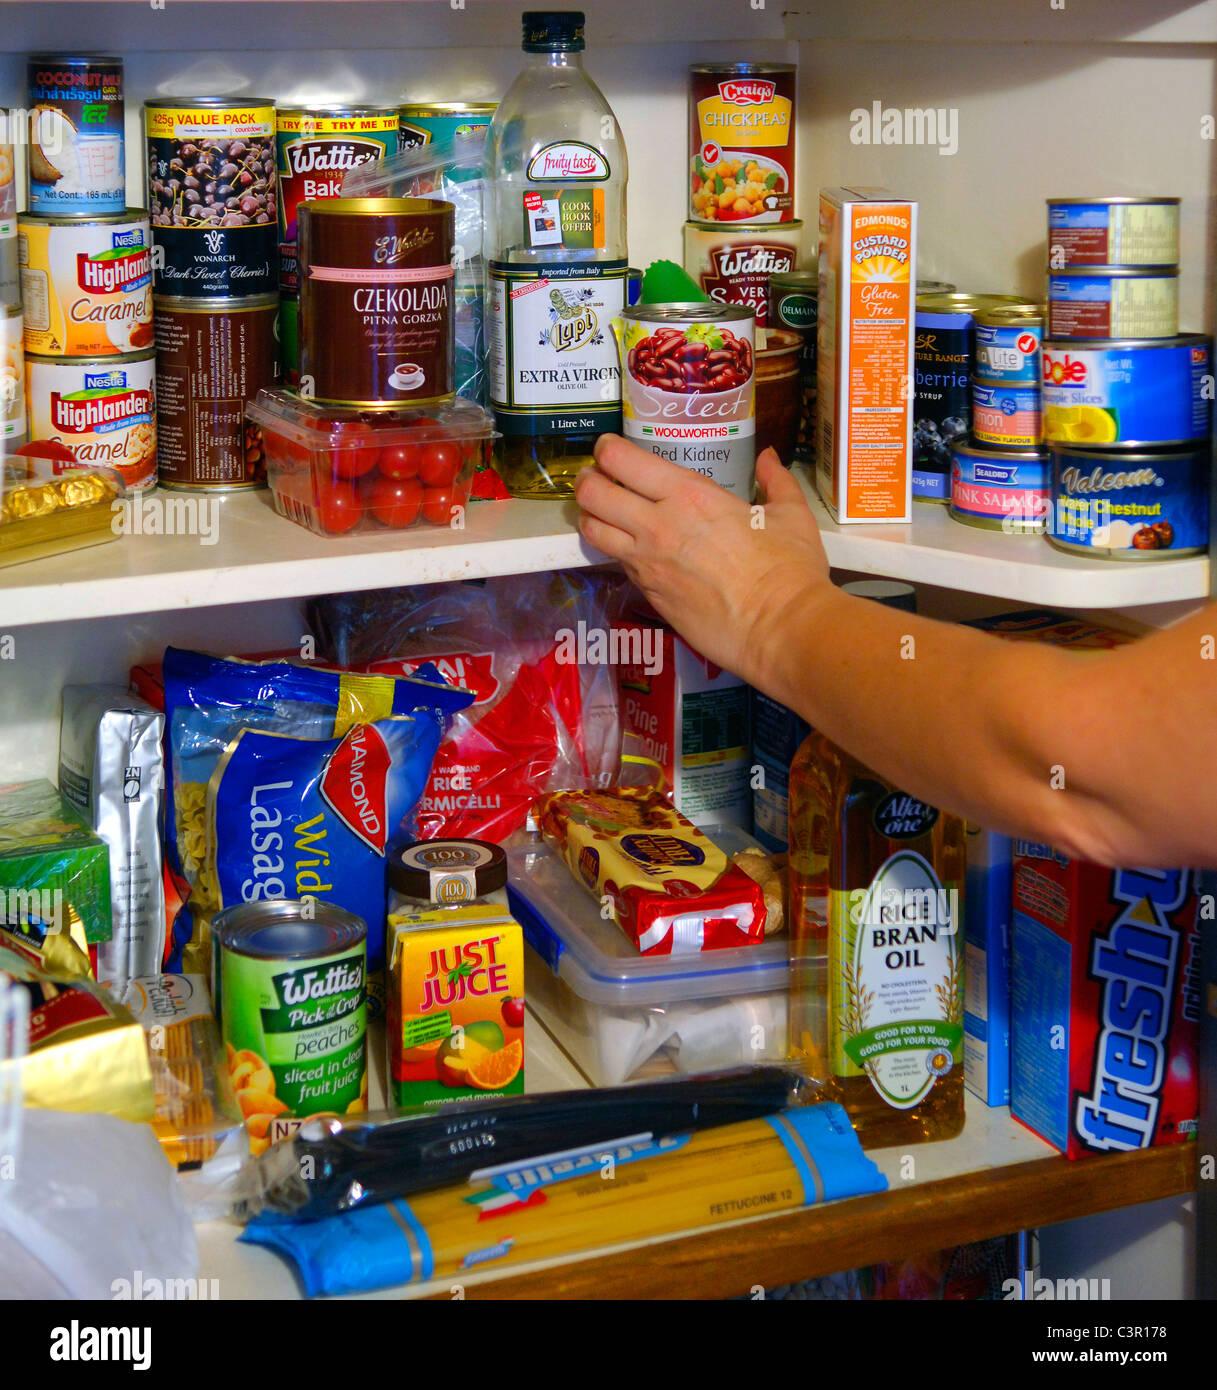 Kitchen pantry Stockfoto Lizenzfreies Bild Alamy